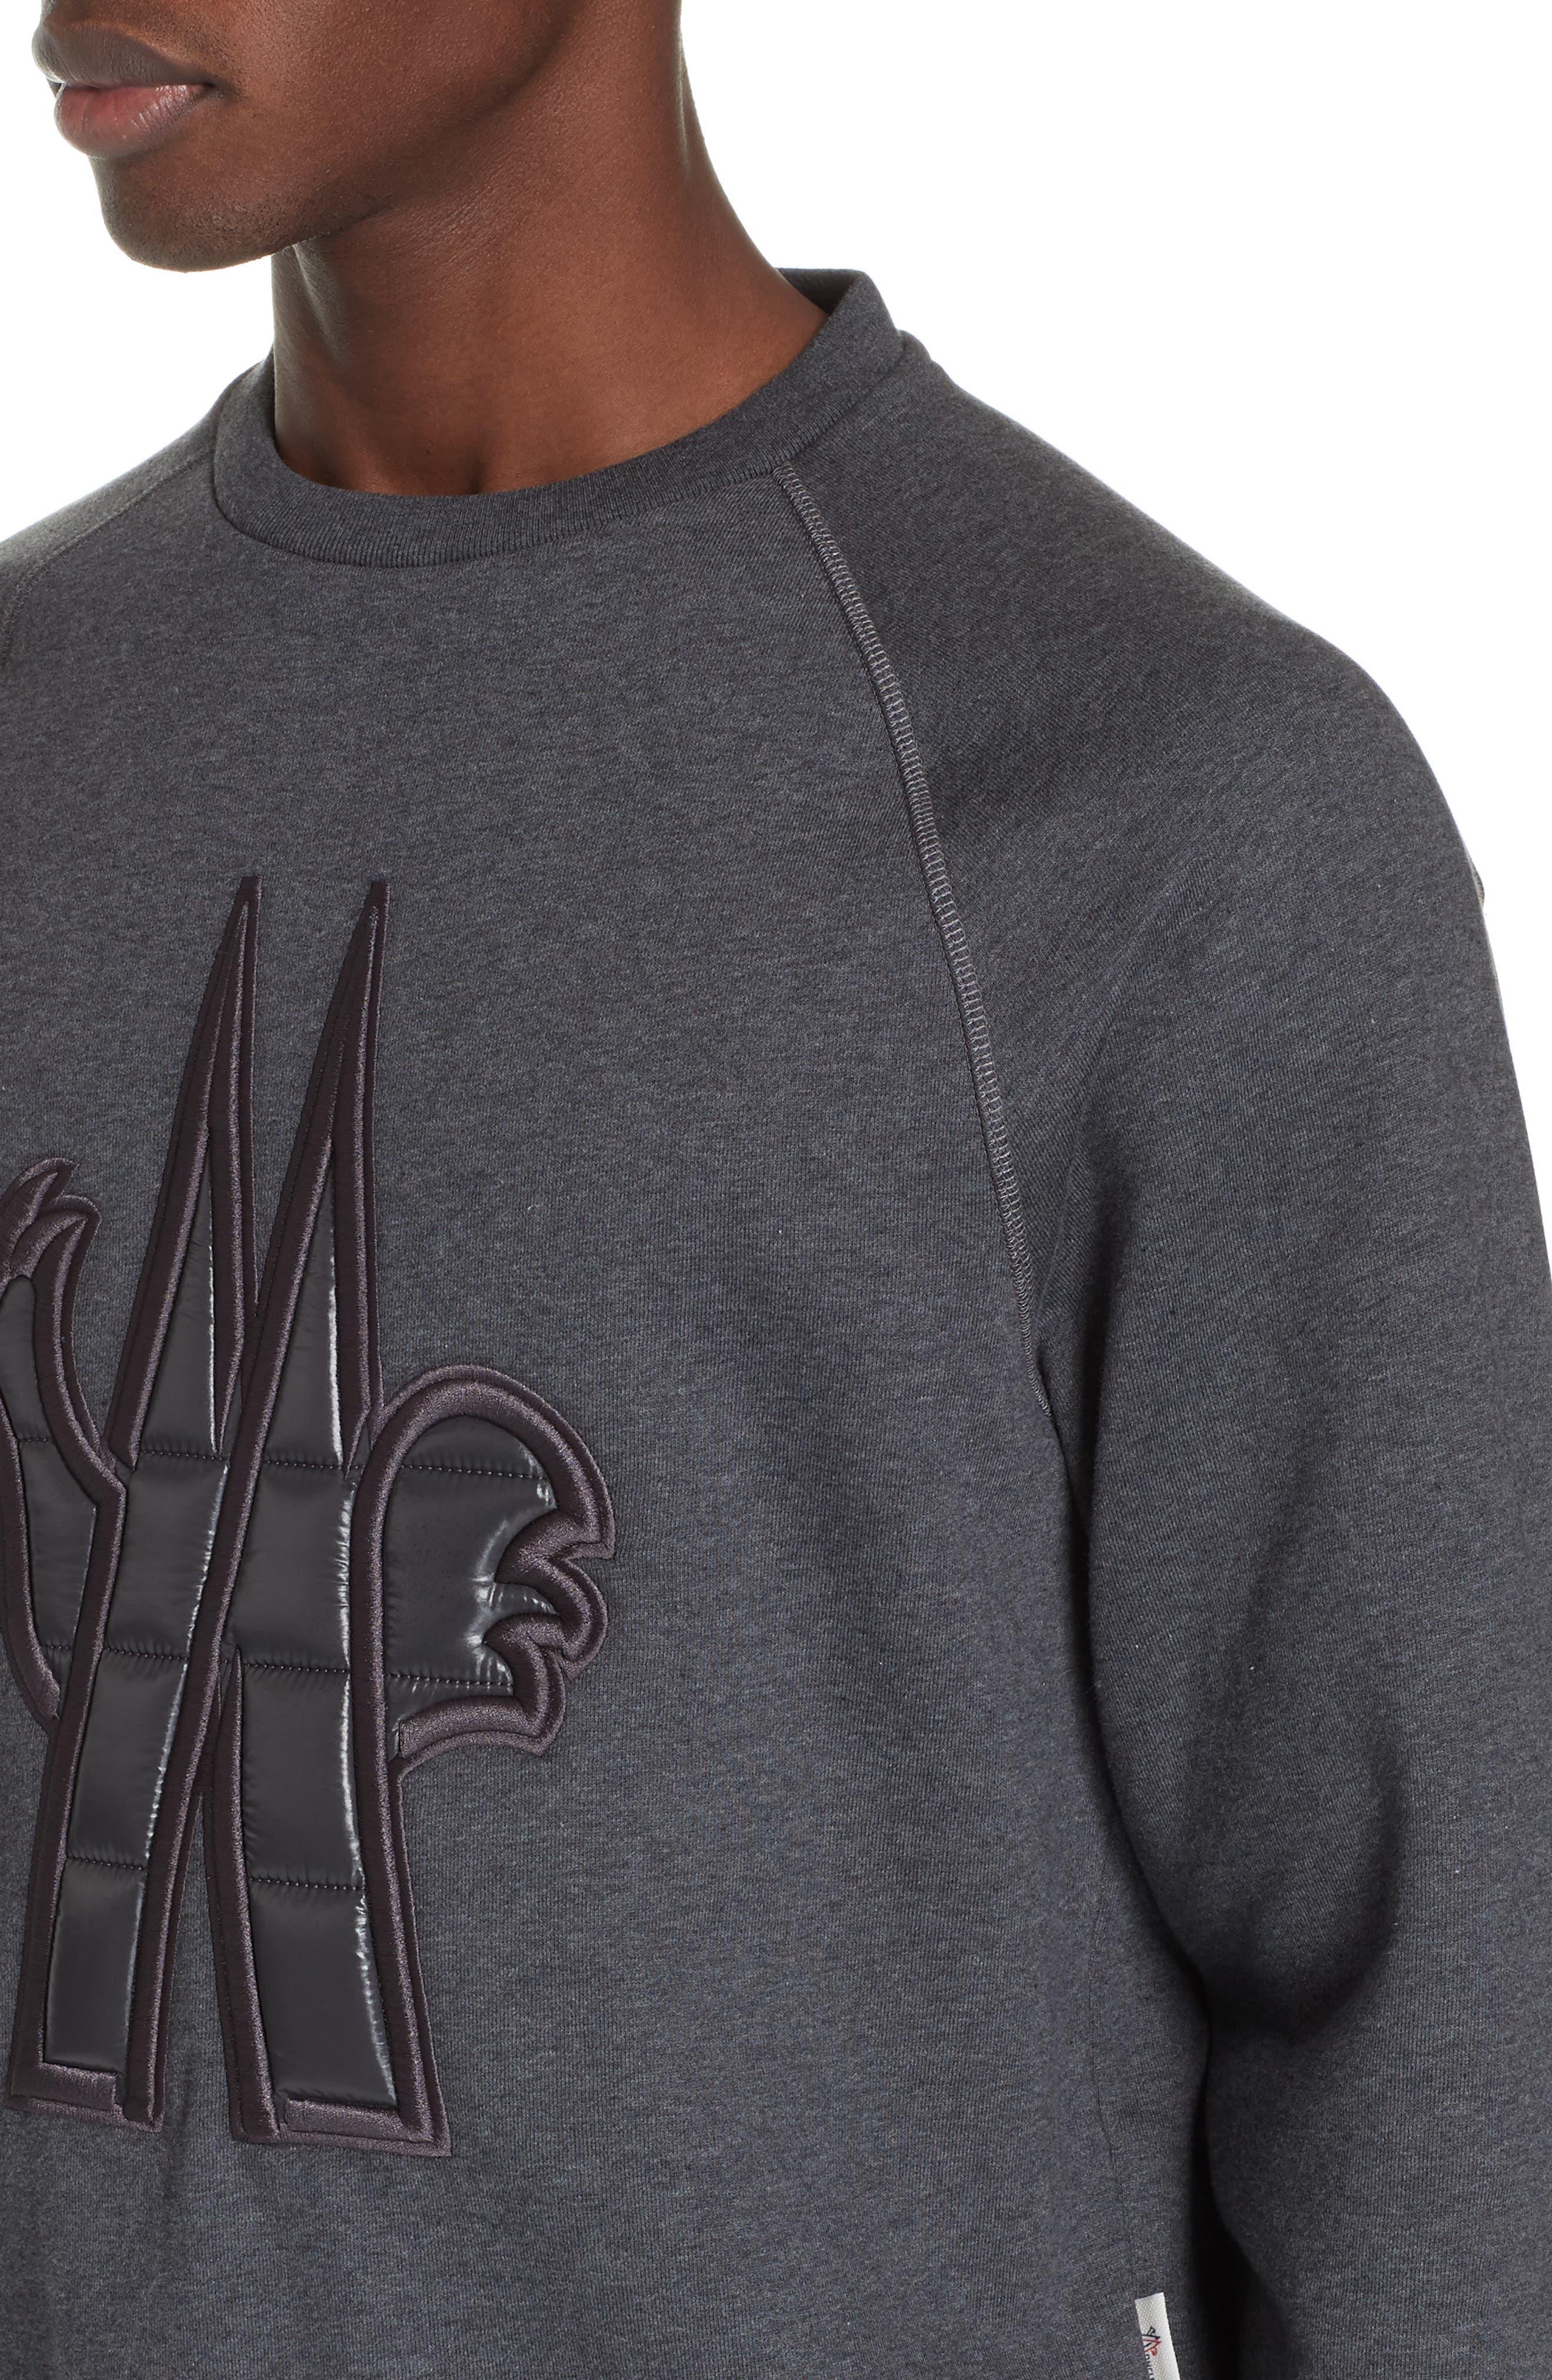 Logo Sweatshirt,                             Alternate thumbnail 4, color,                             GREY